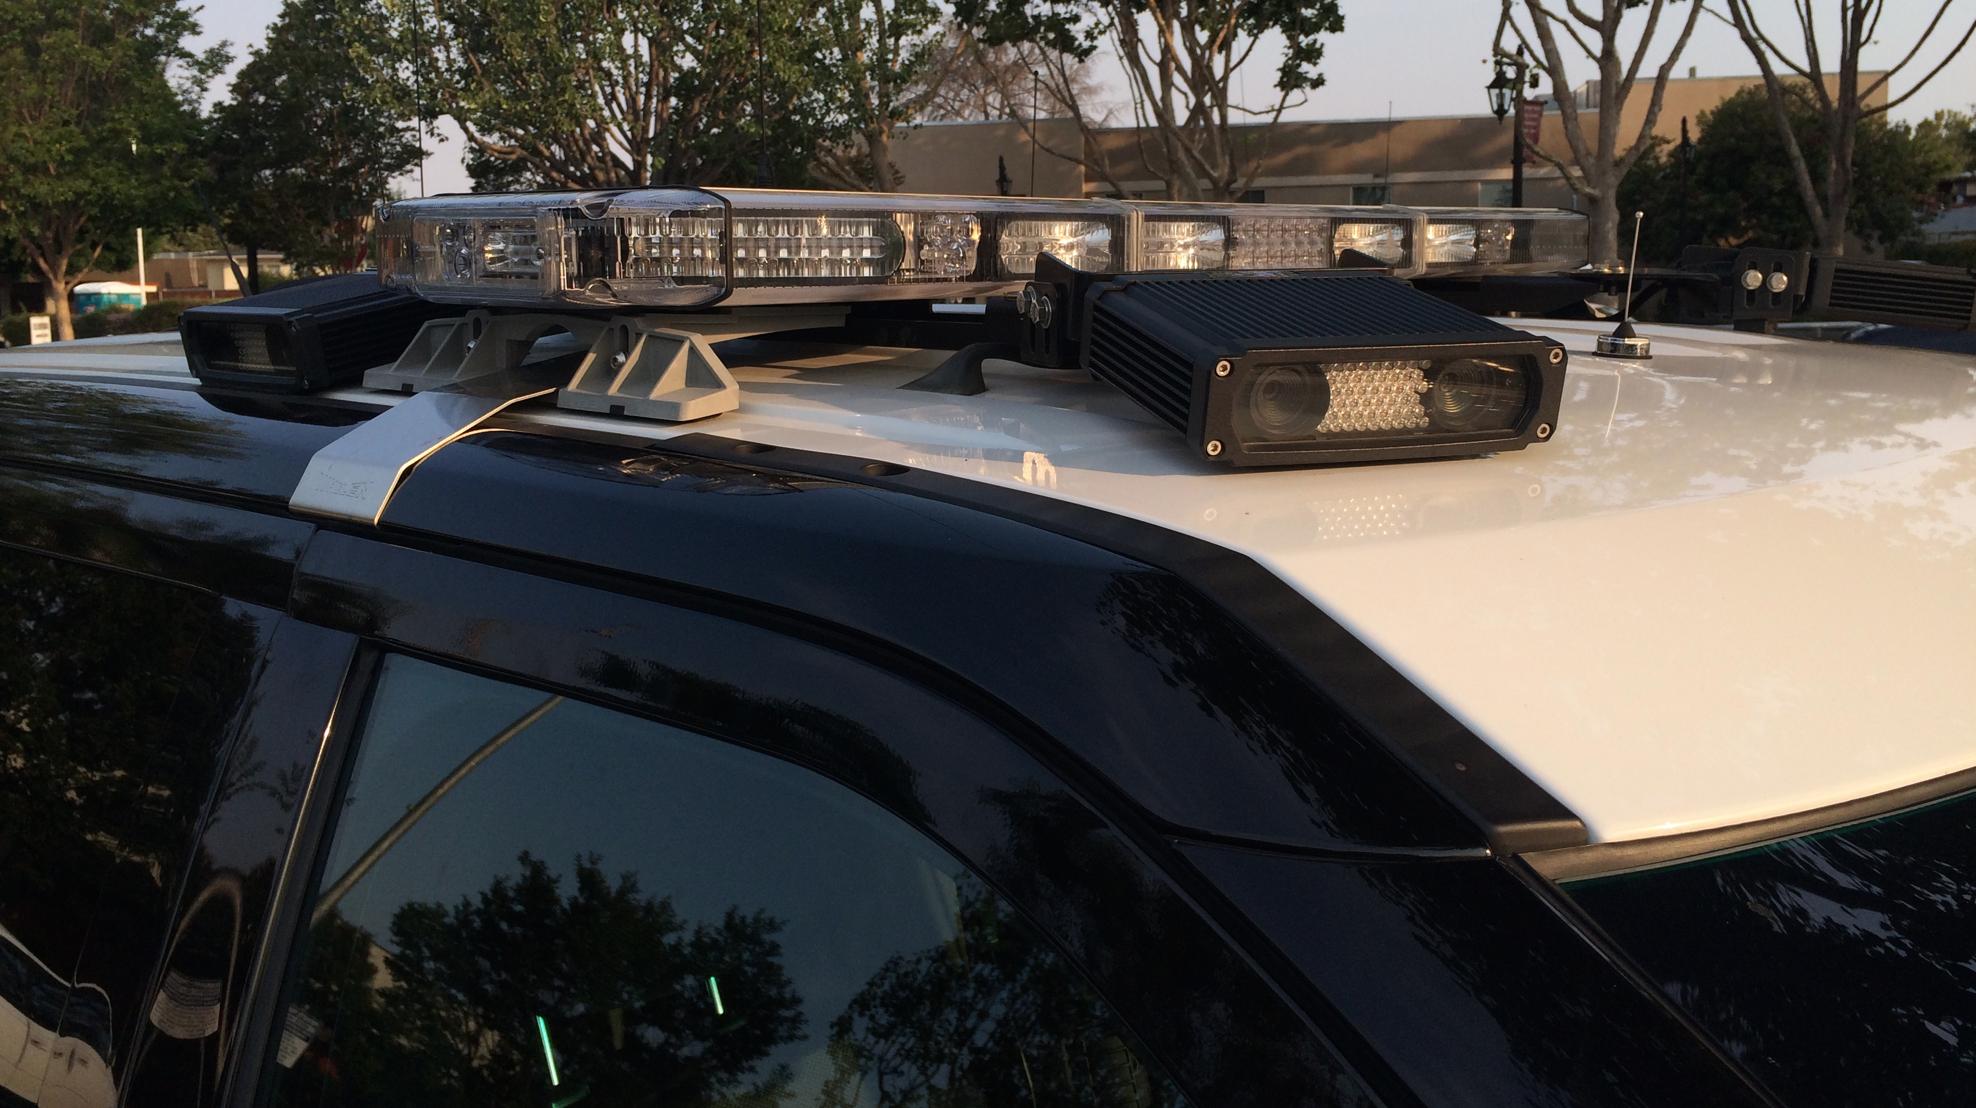 California Highway Patrol Bought 216 Vigilant Video License Plate